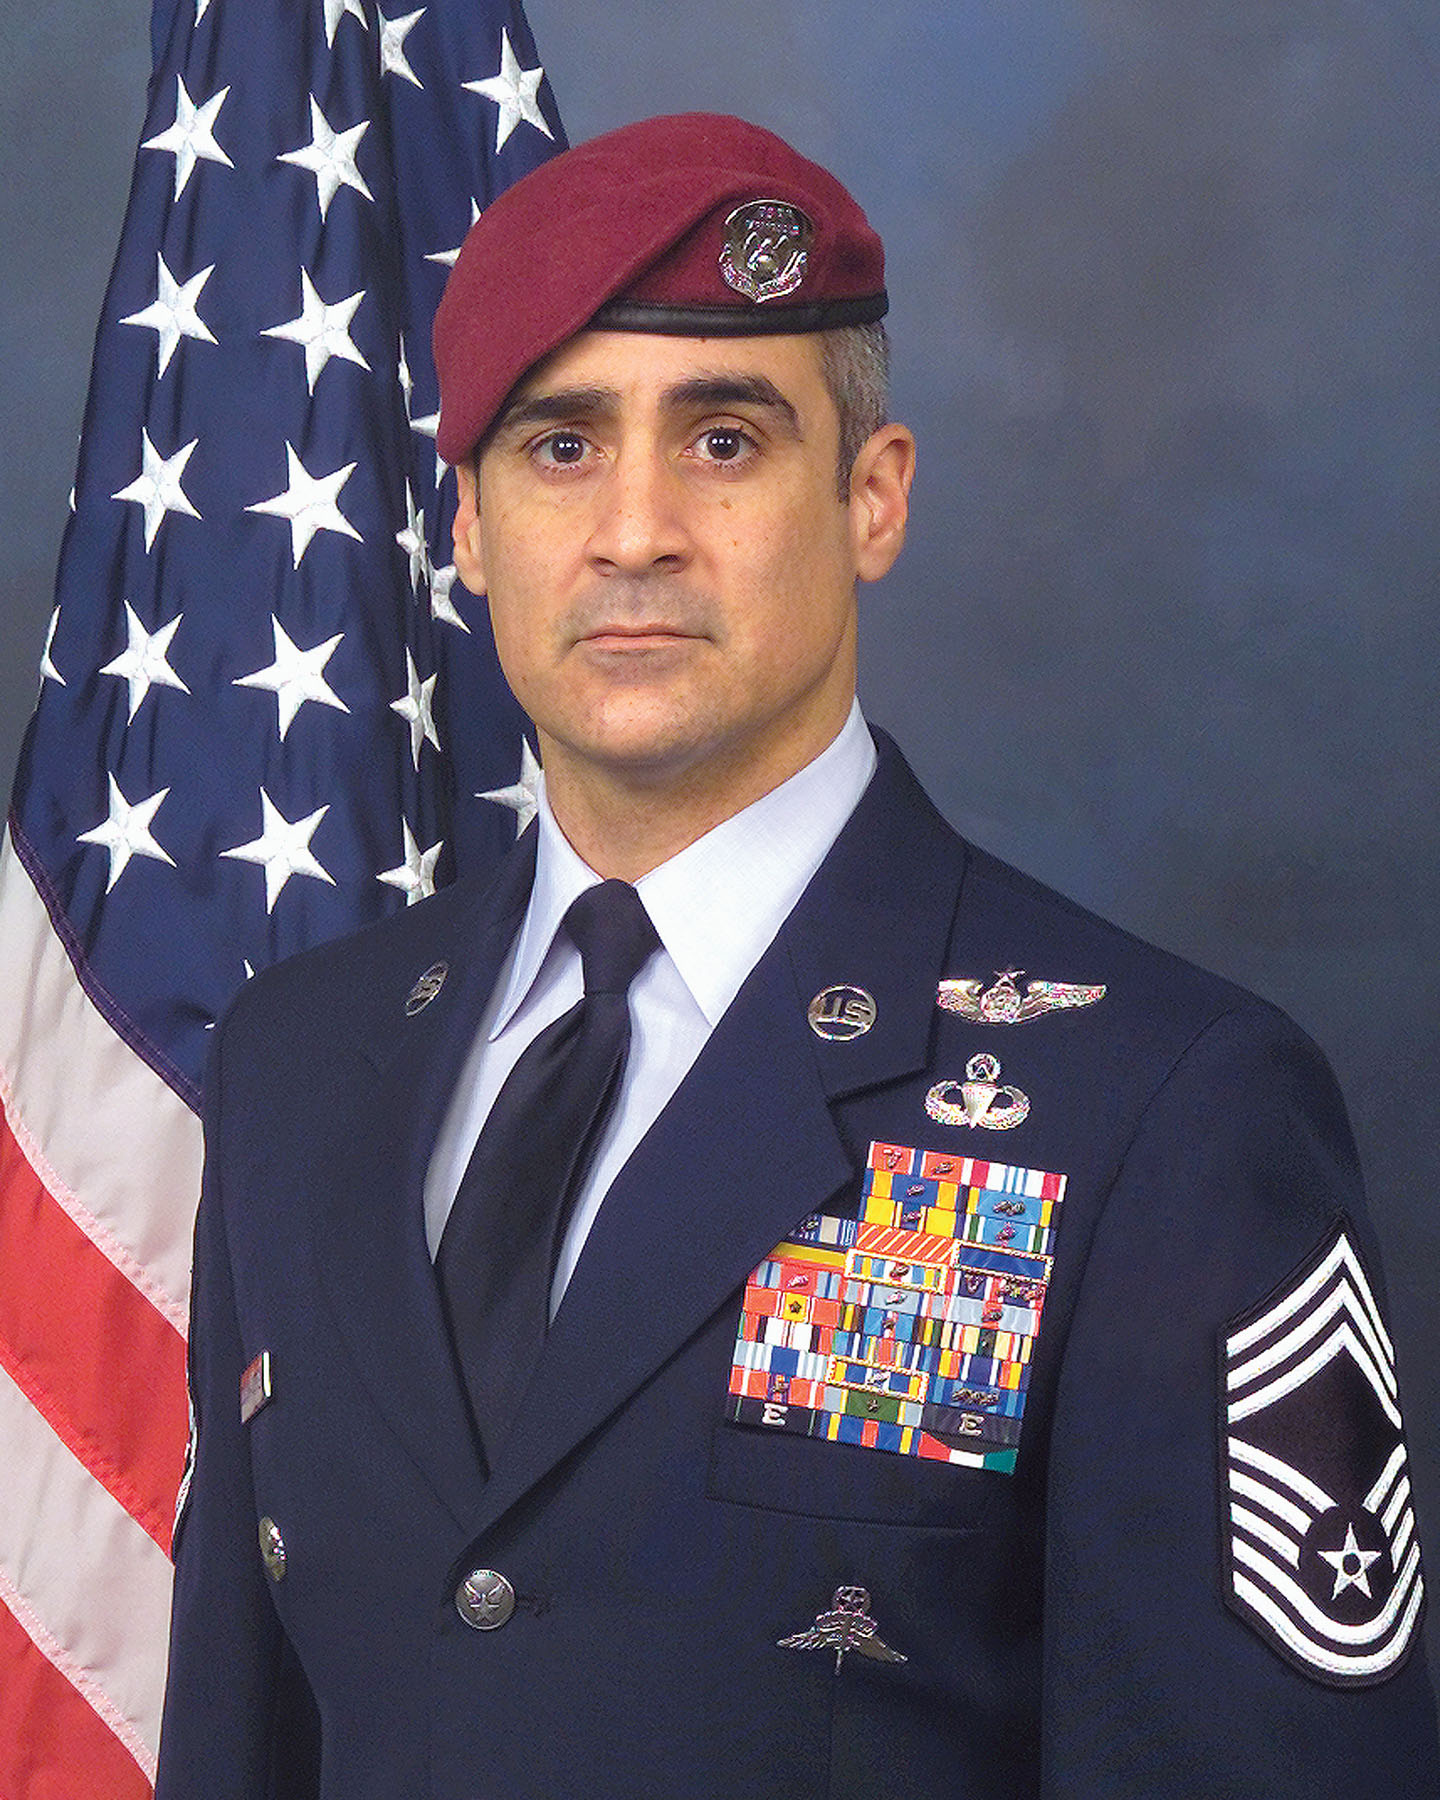 United states air force dress uniform images